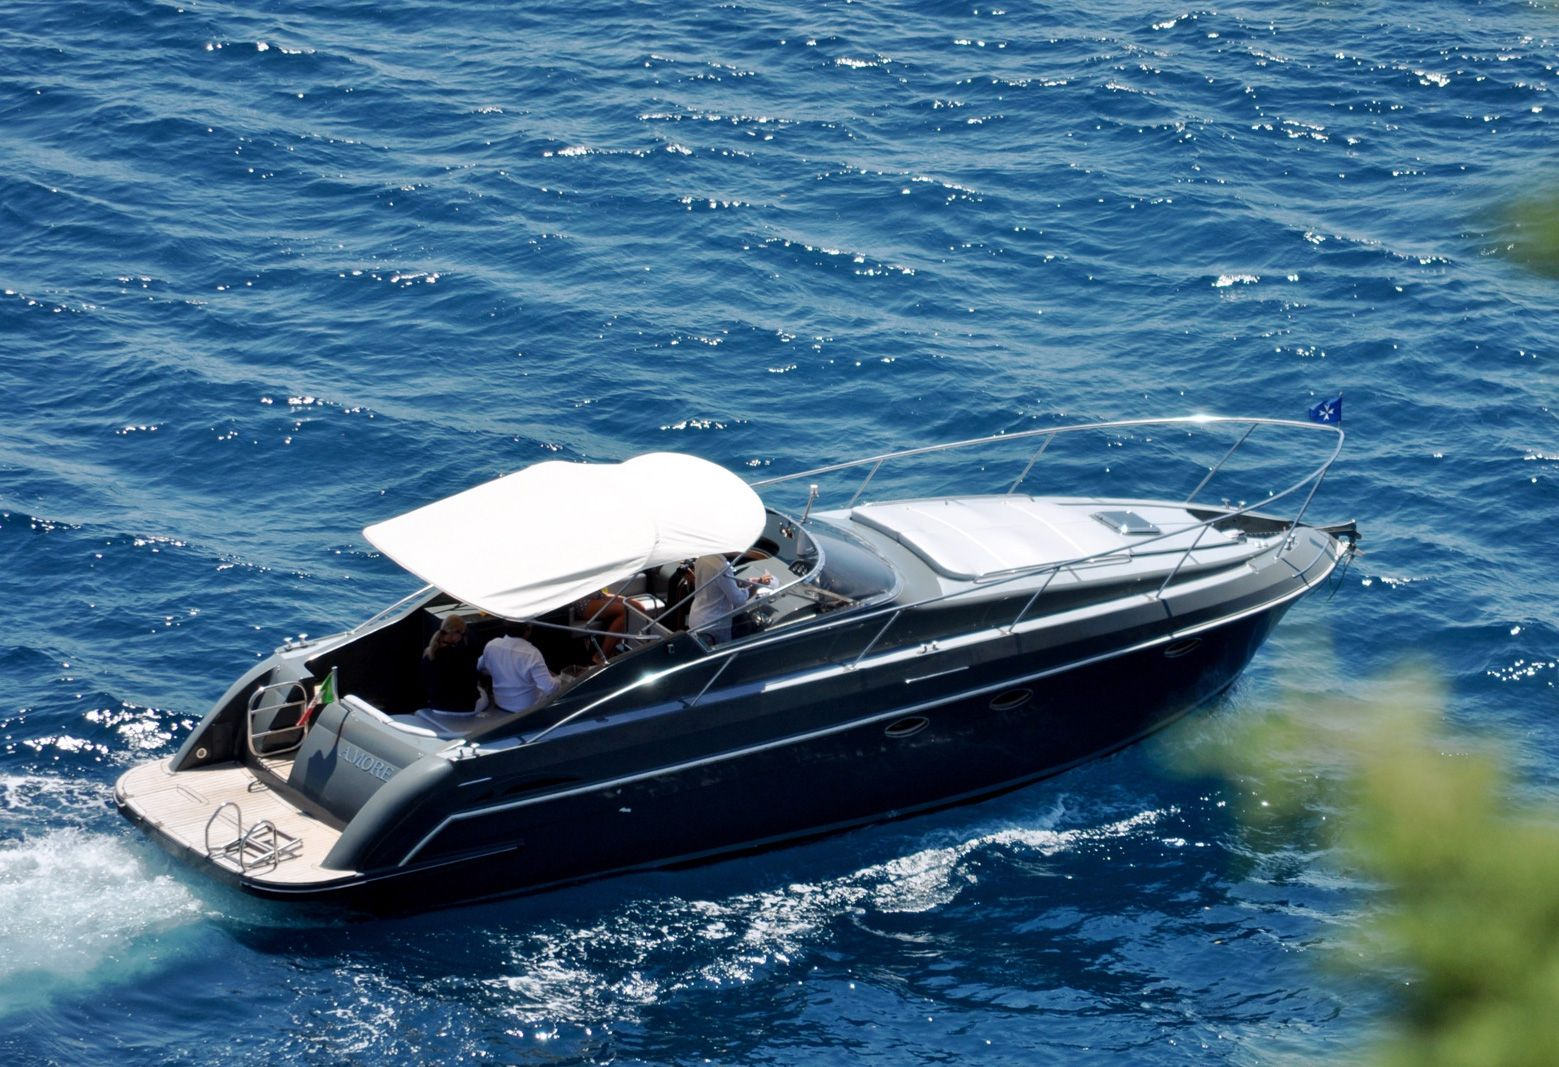 AMORE - Nima 34 - Day Charter Yacht - Capri - Naples - Amalfi